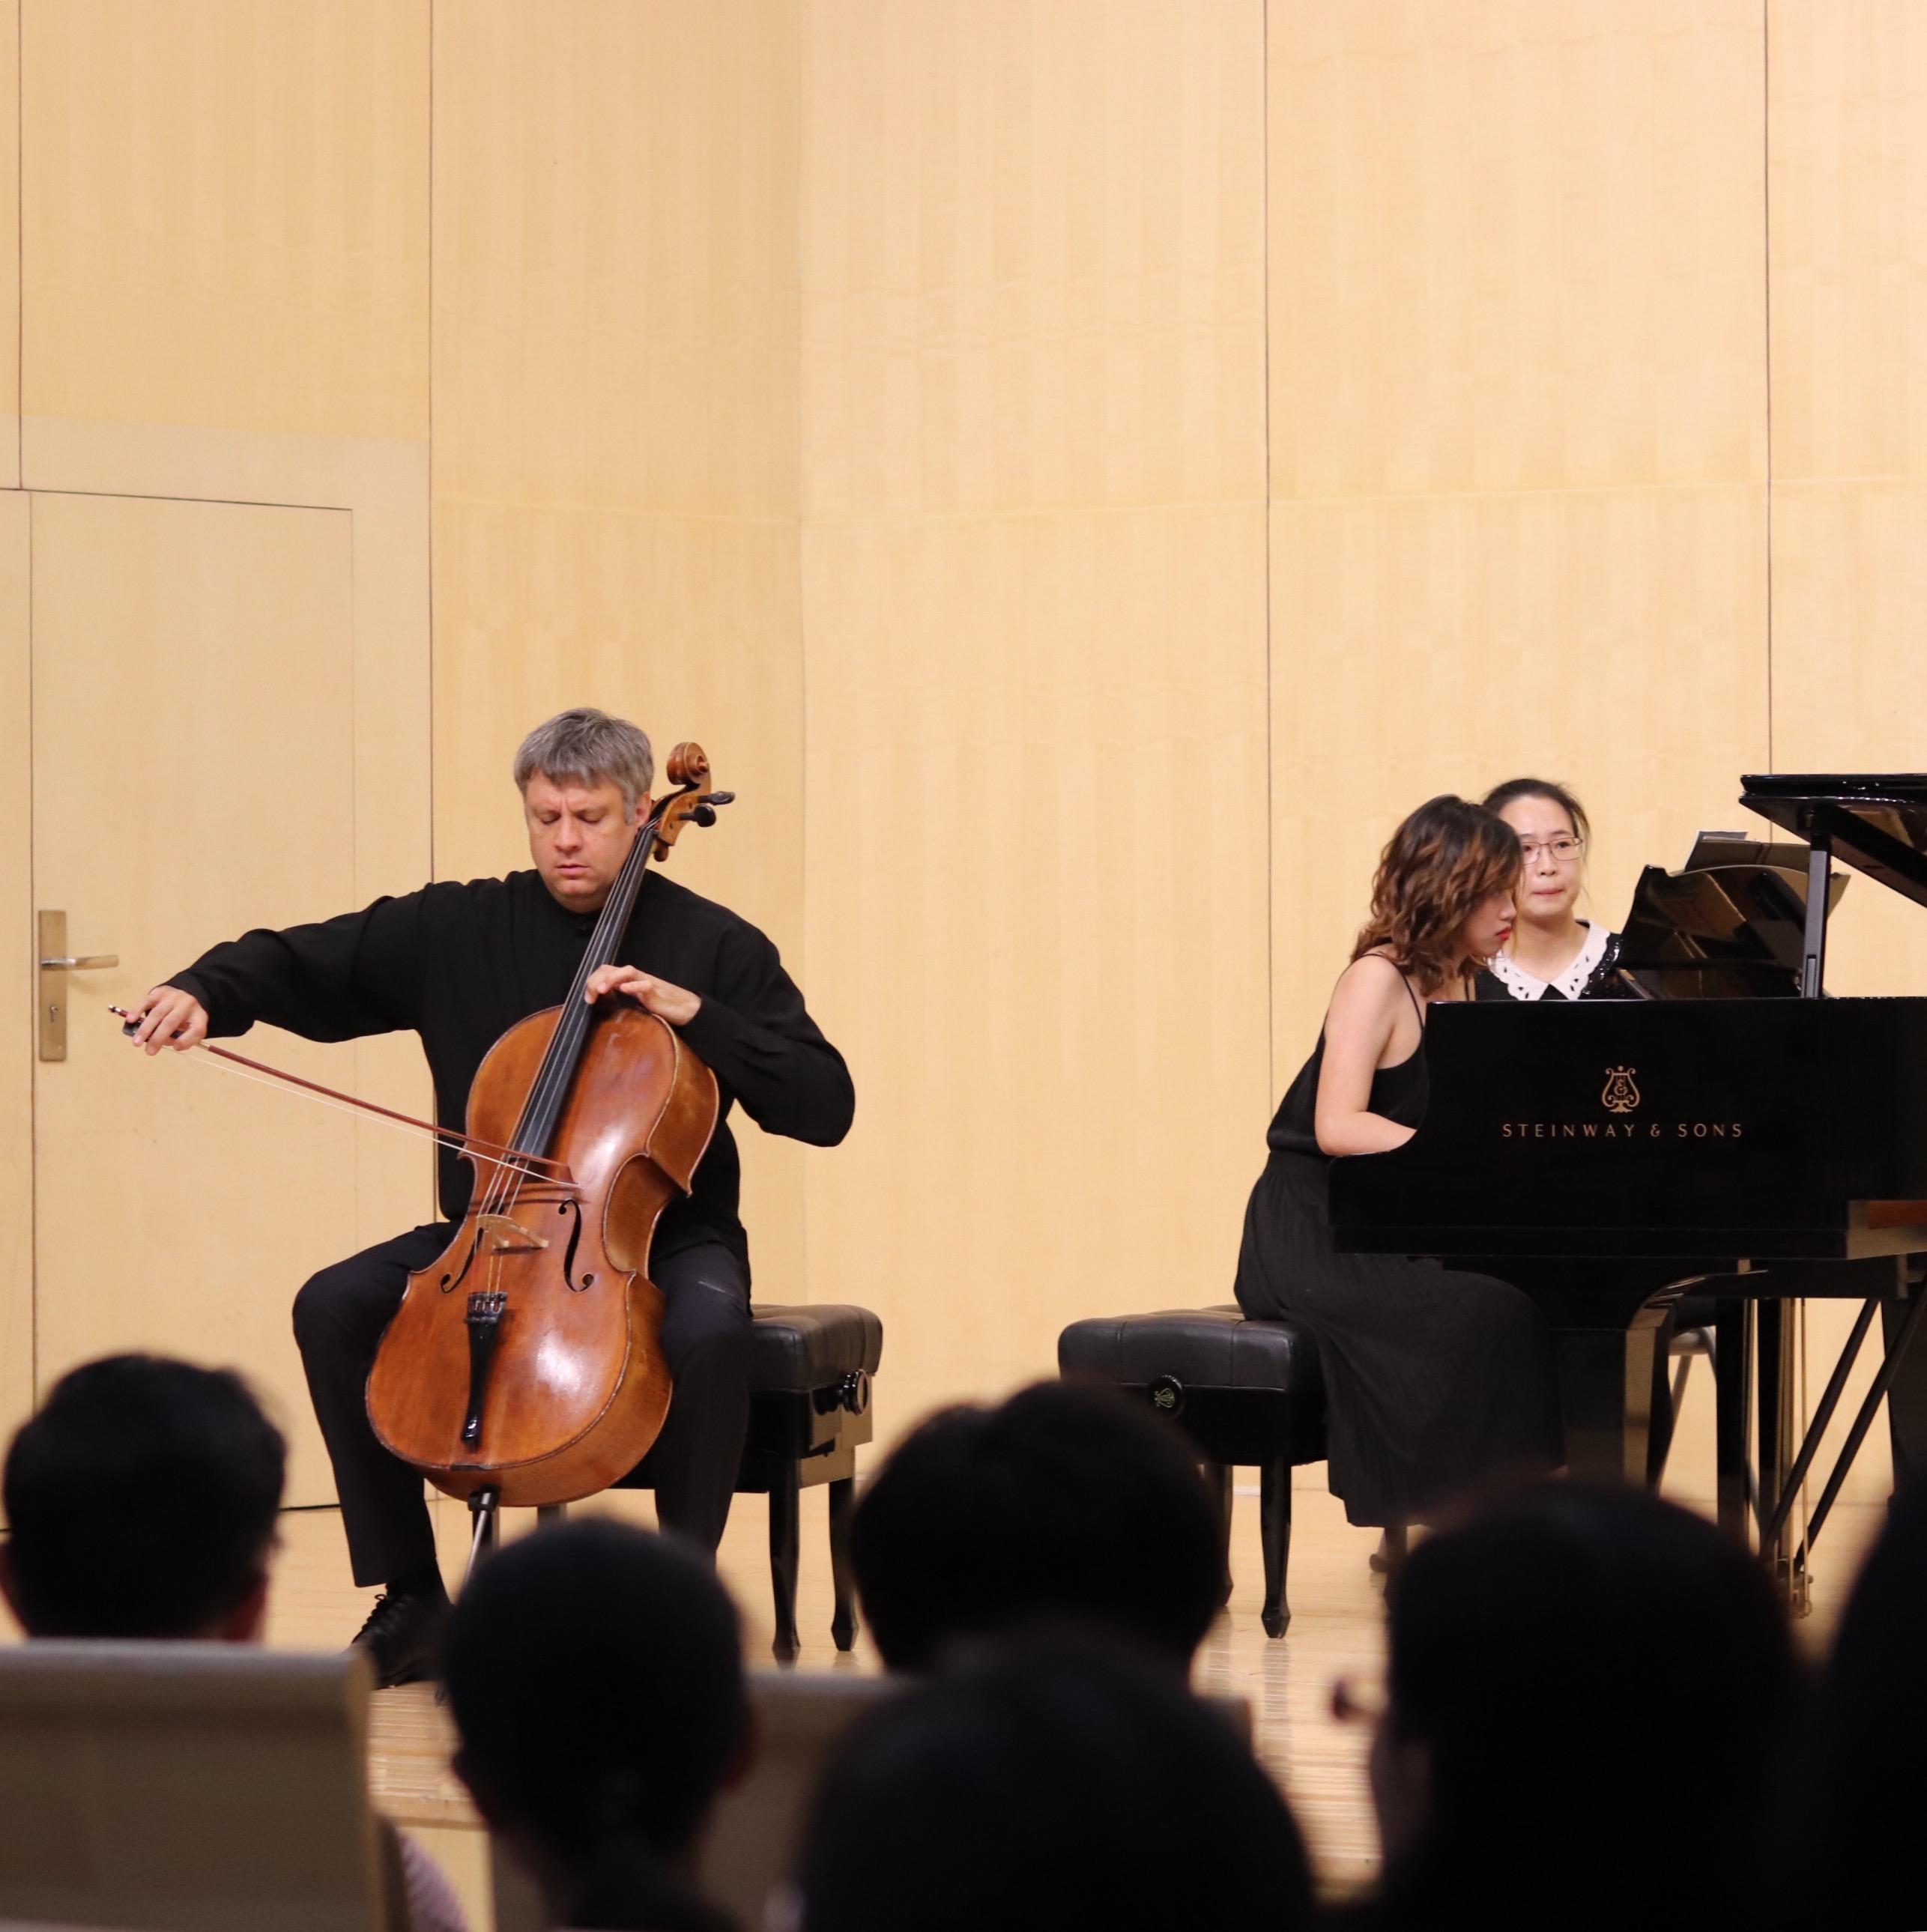 Alexander Suleiman Solo Recital in CCOM